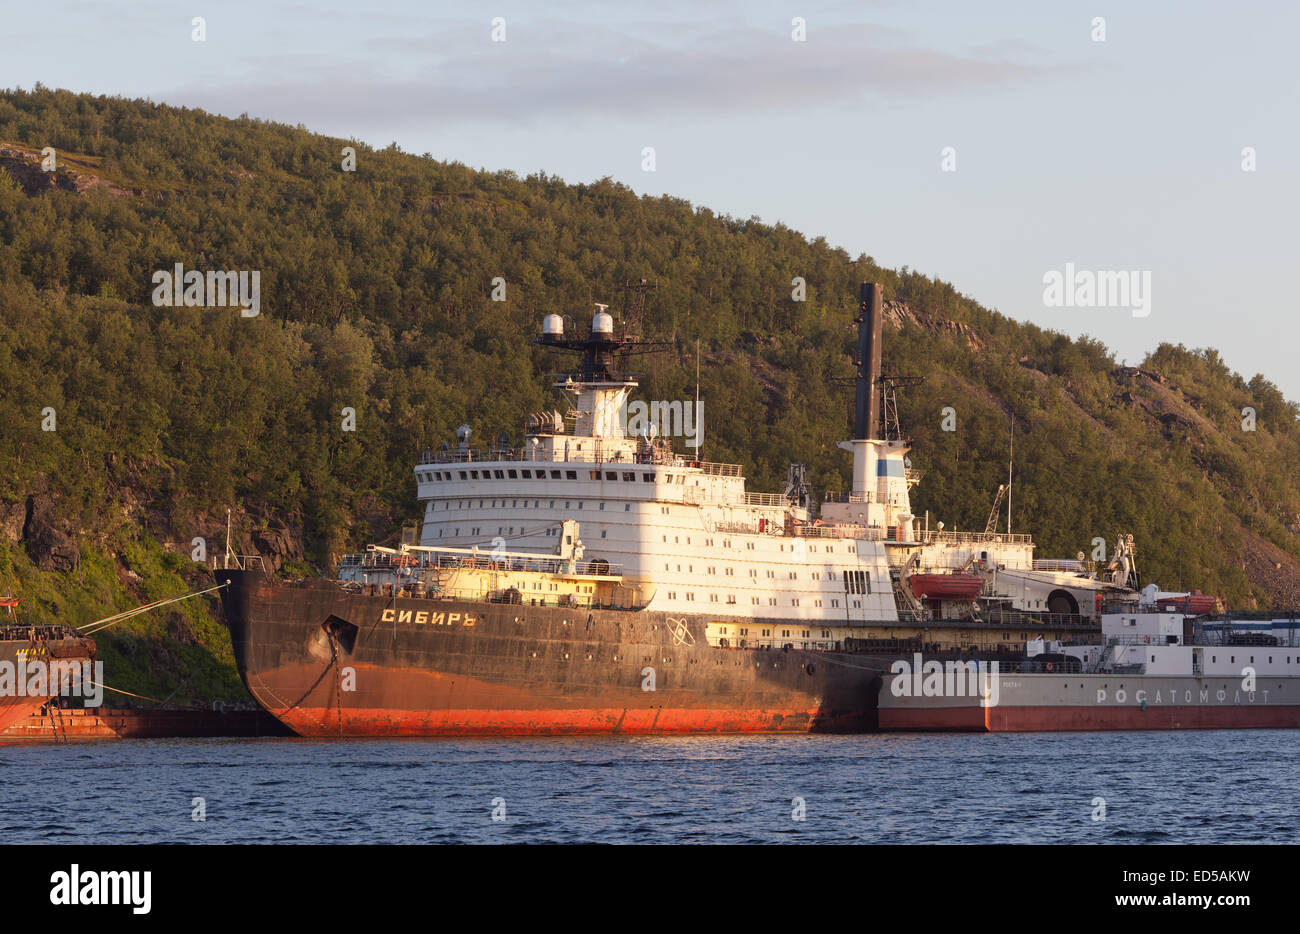 Nuclear-powered icebreaker 'Siberia' - Stock Image